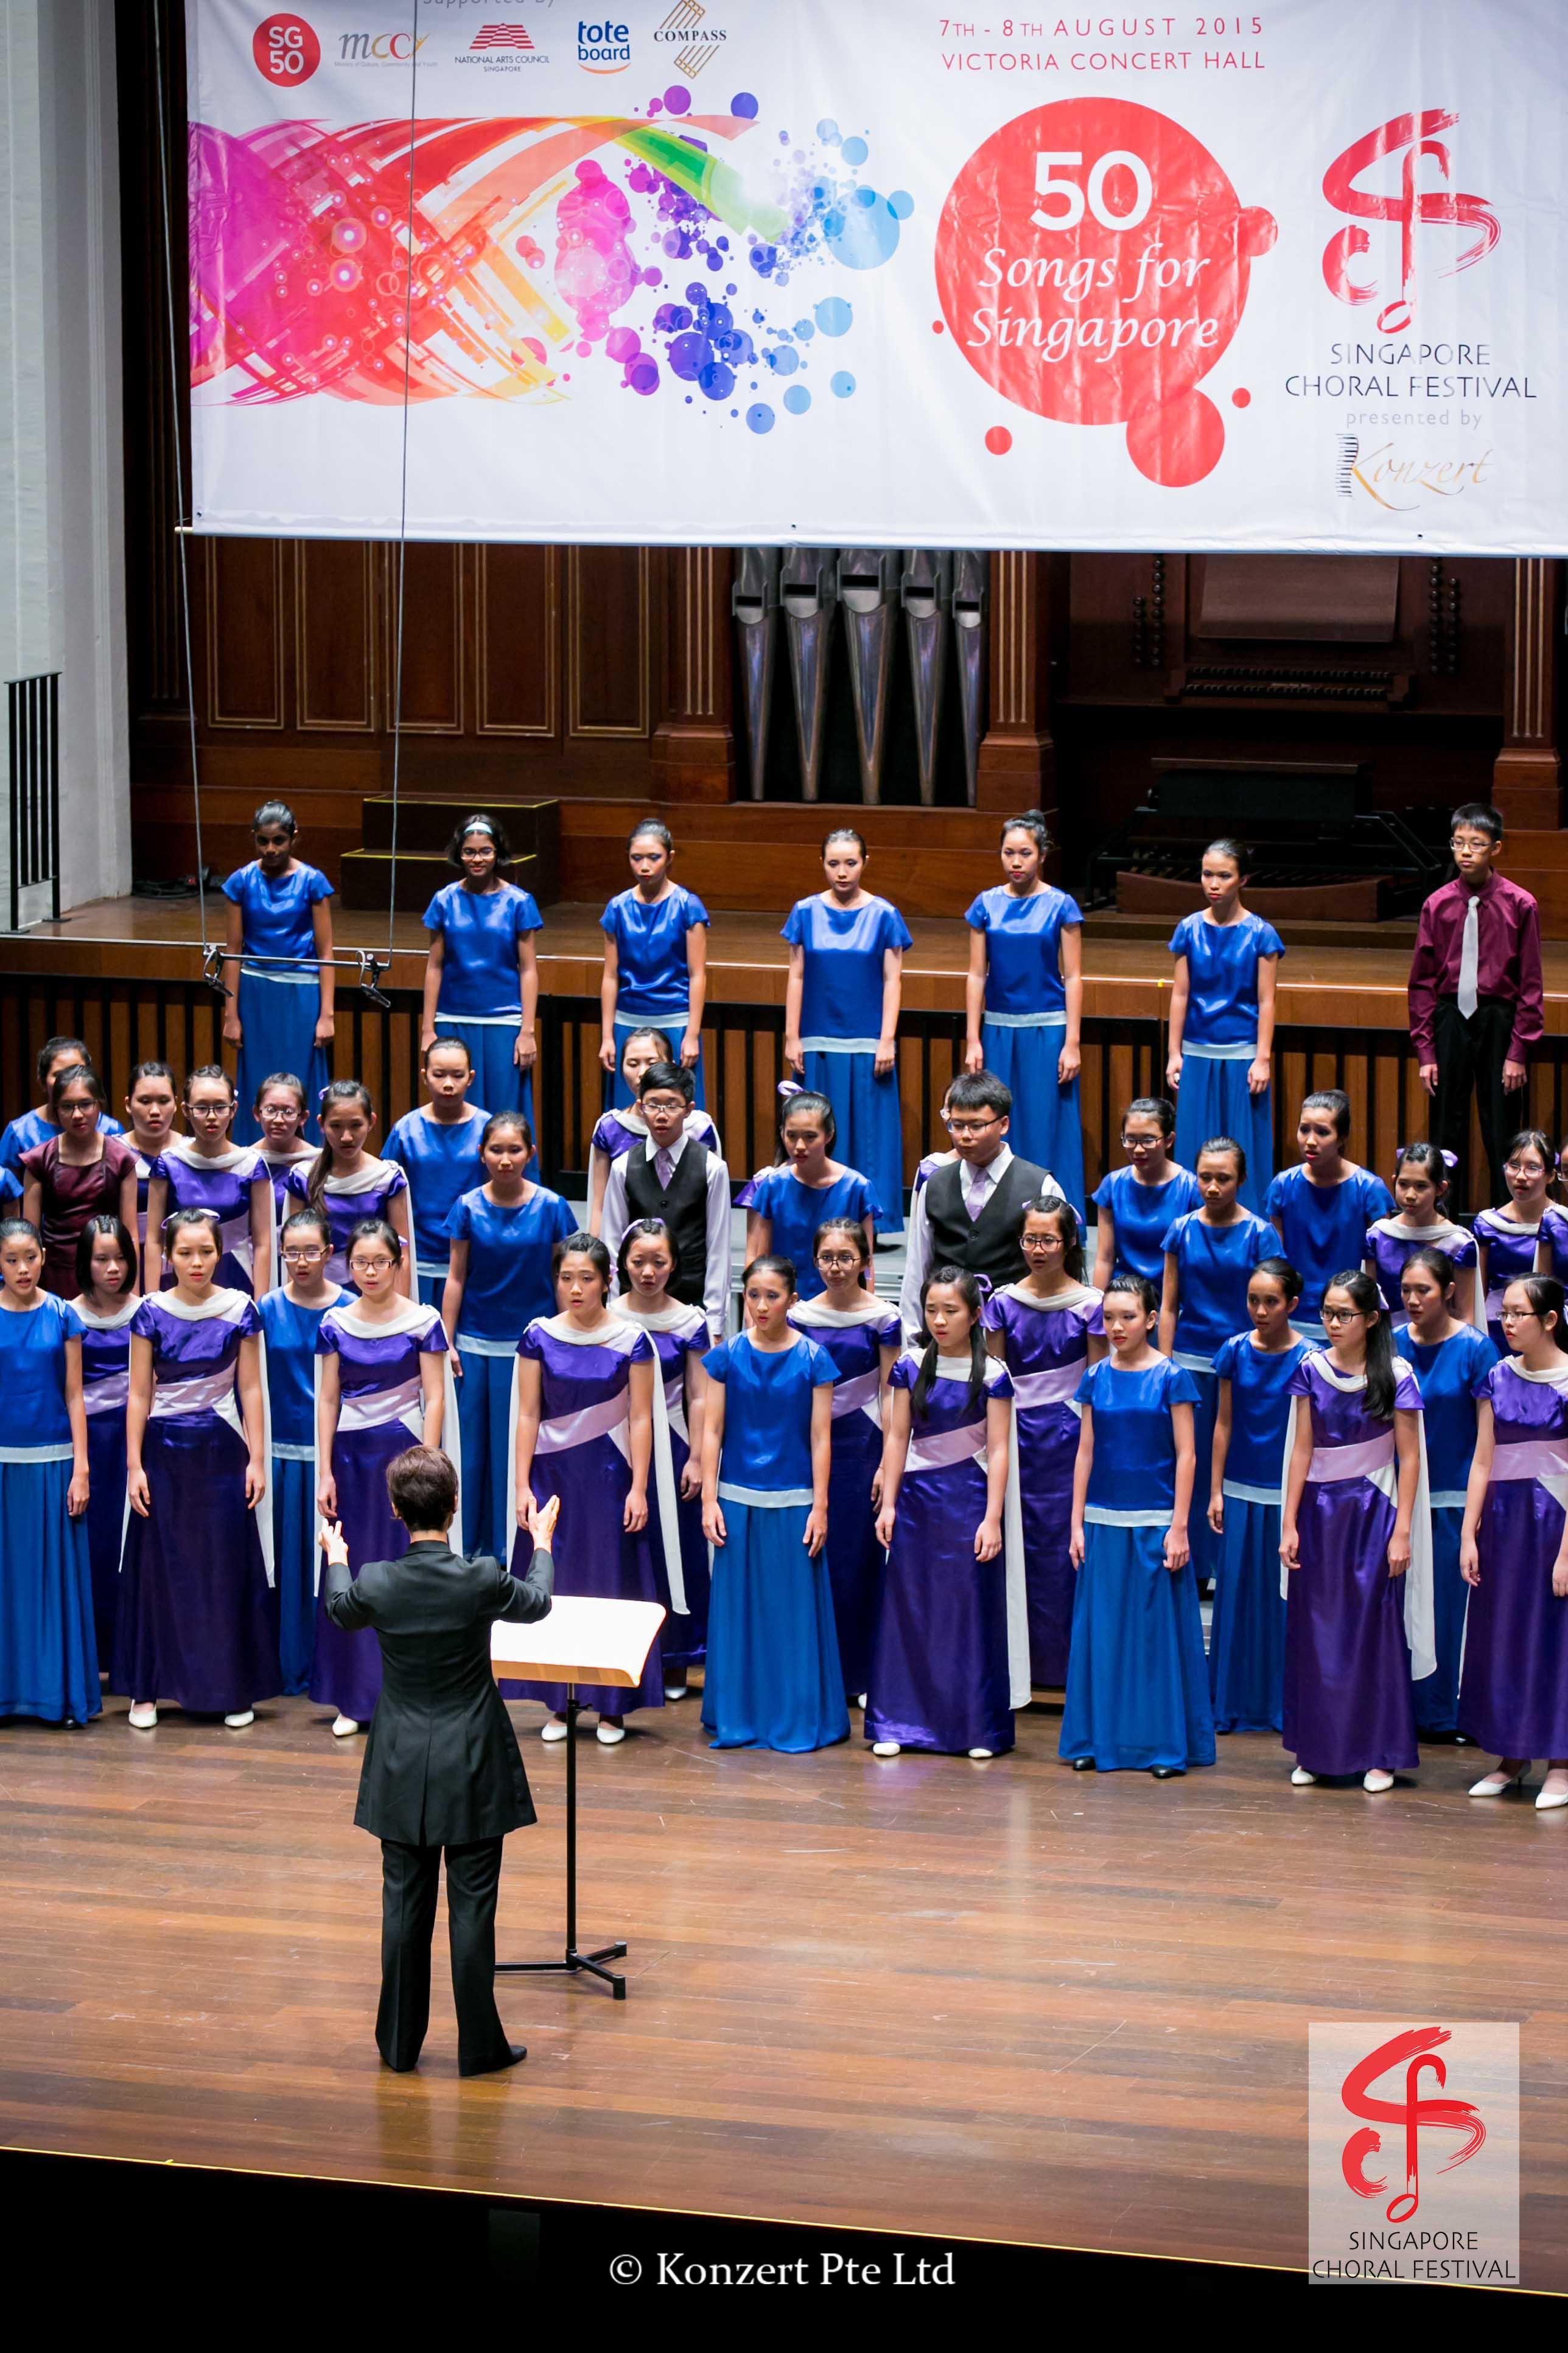 Singapore Choral Festival 7-8-15 (281).jpg